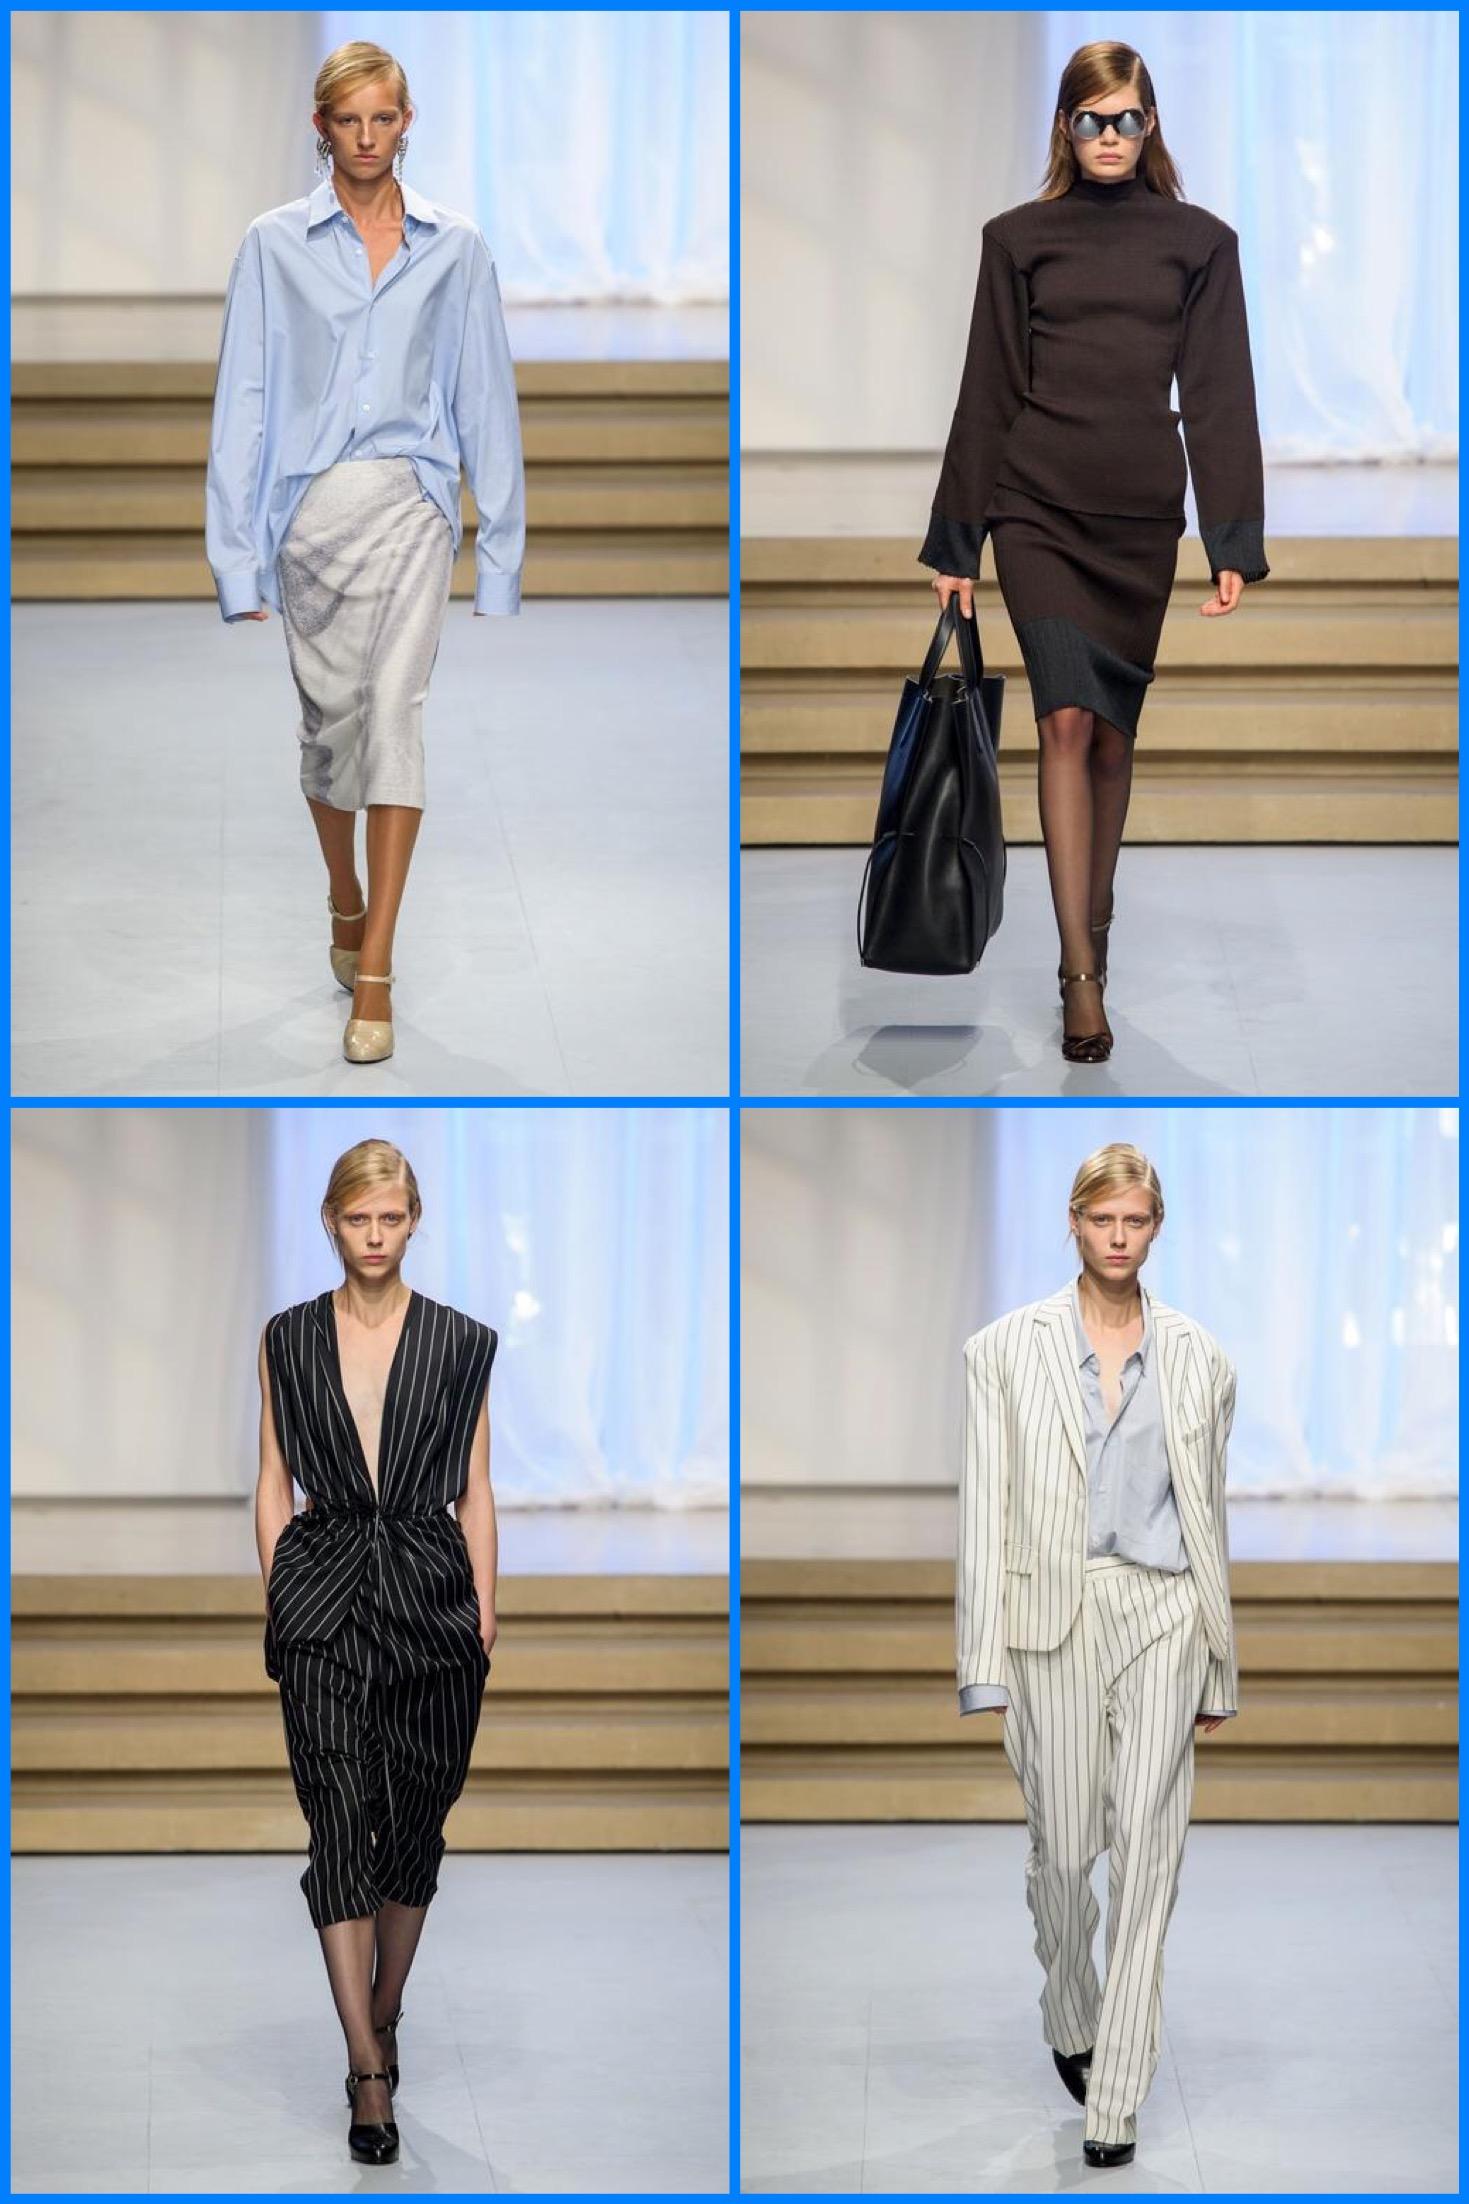 milano-fashion-week-pret-a-porter-spring-summer-2017-style-jil-sander